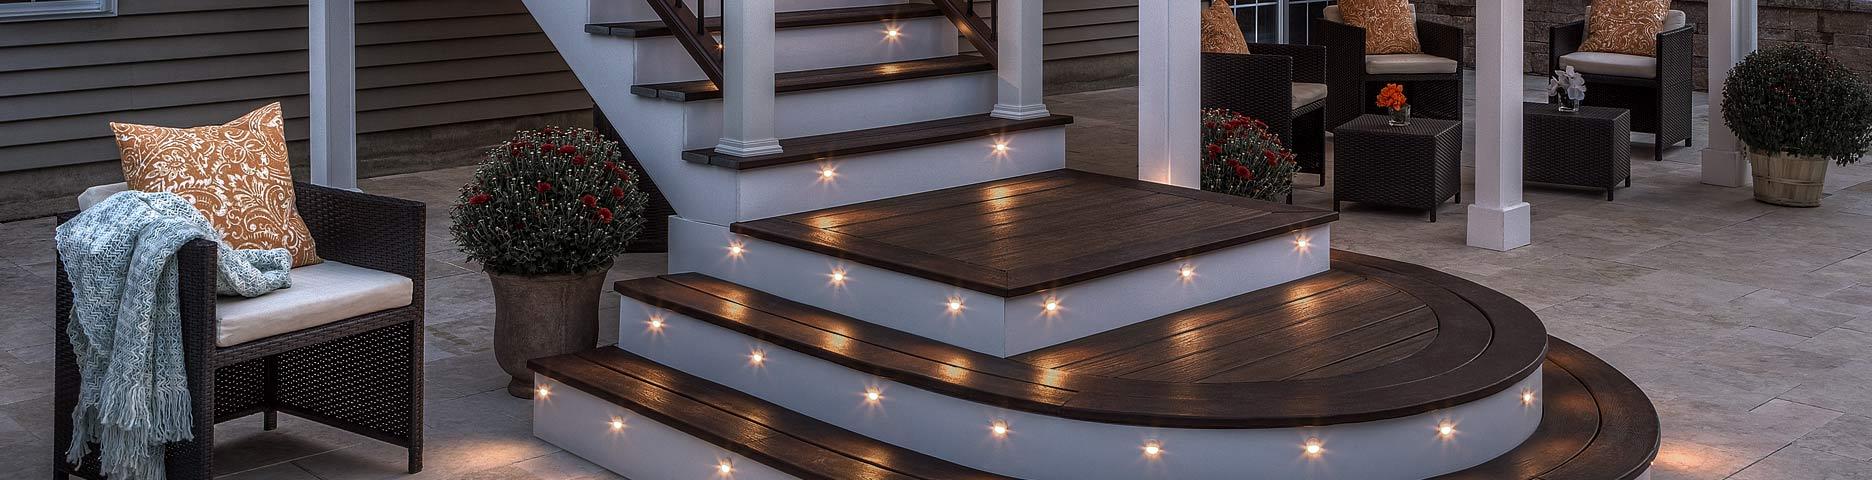 why_add_deck_lighting